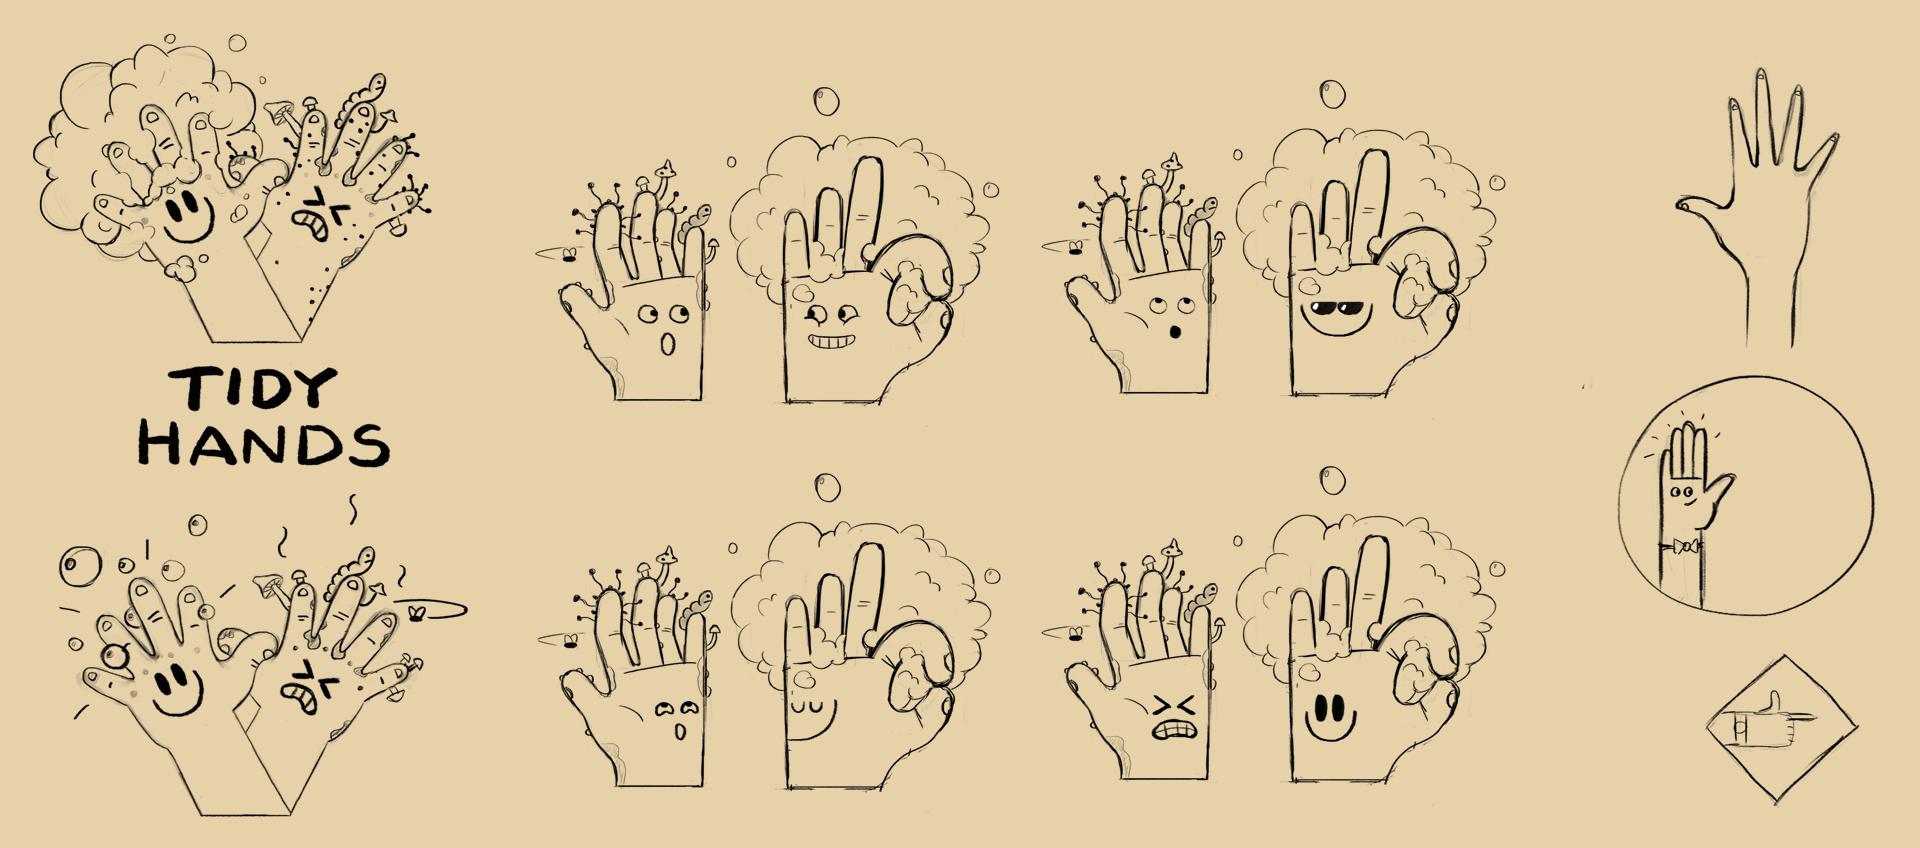 process_hands